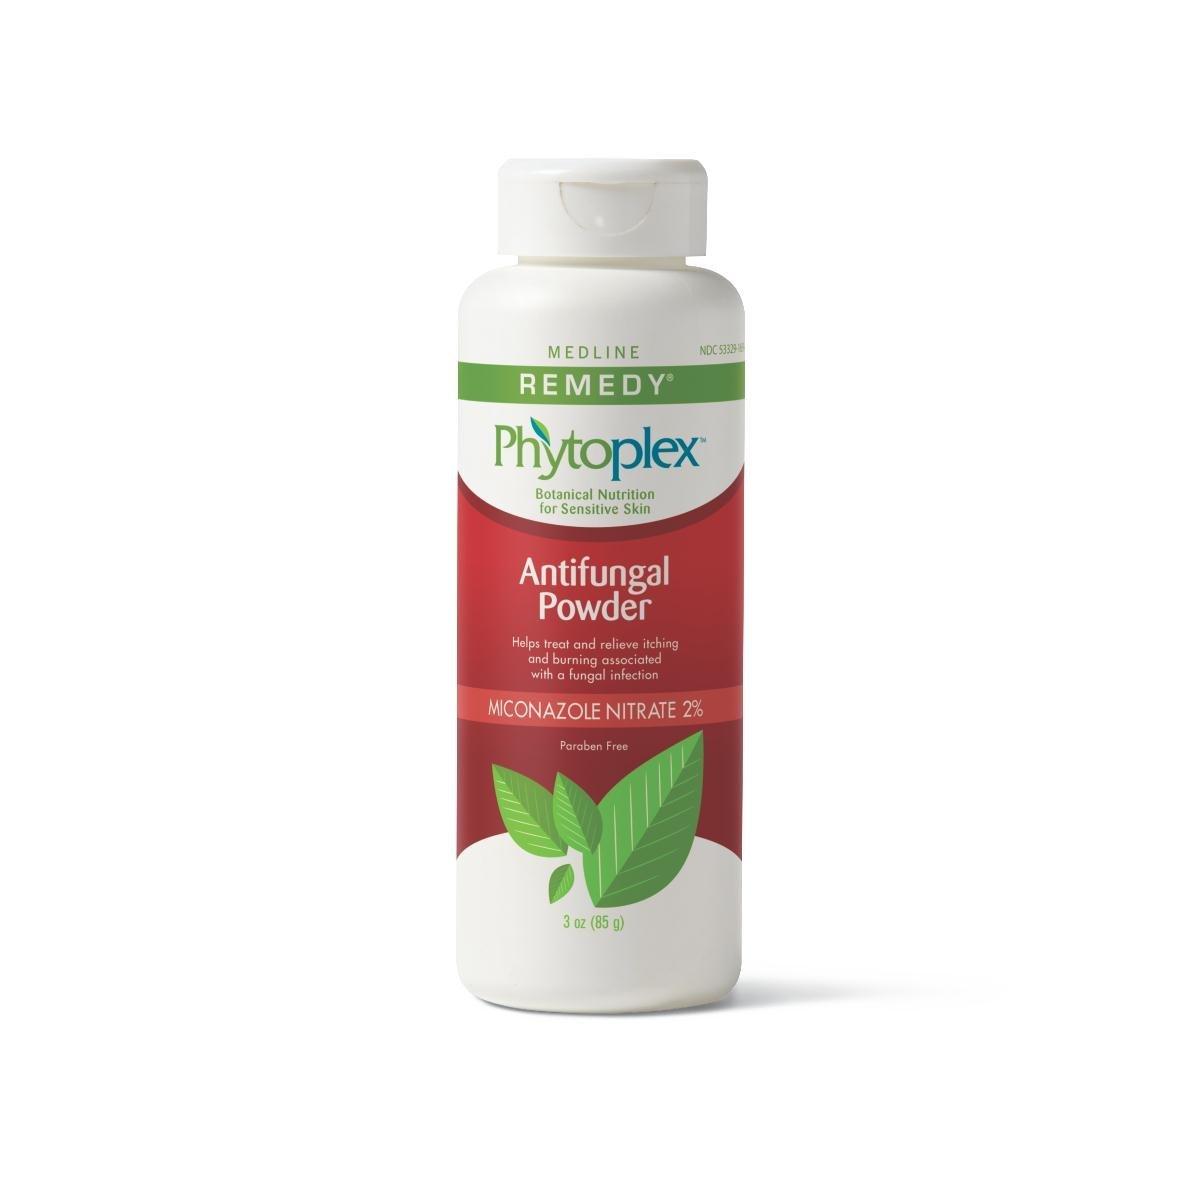 MSC092603 - Remedy Antifungal Powder,White